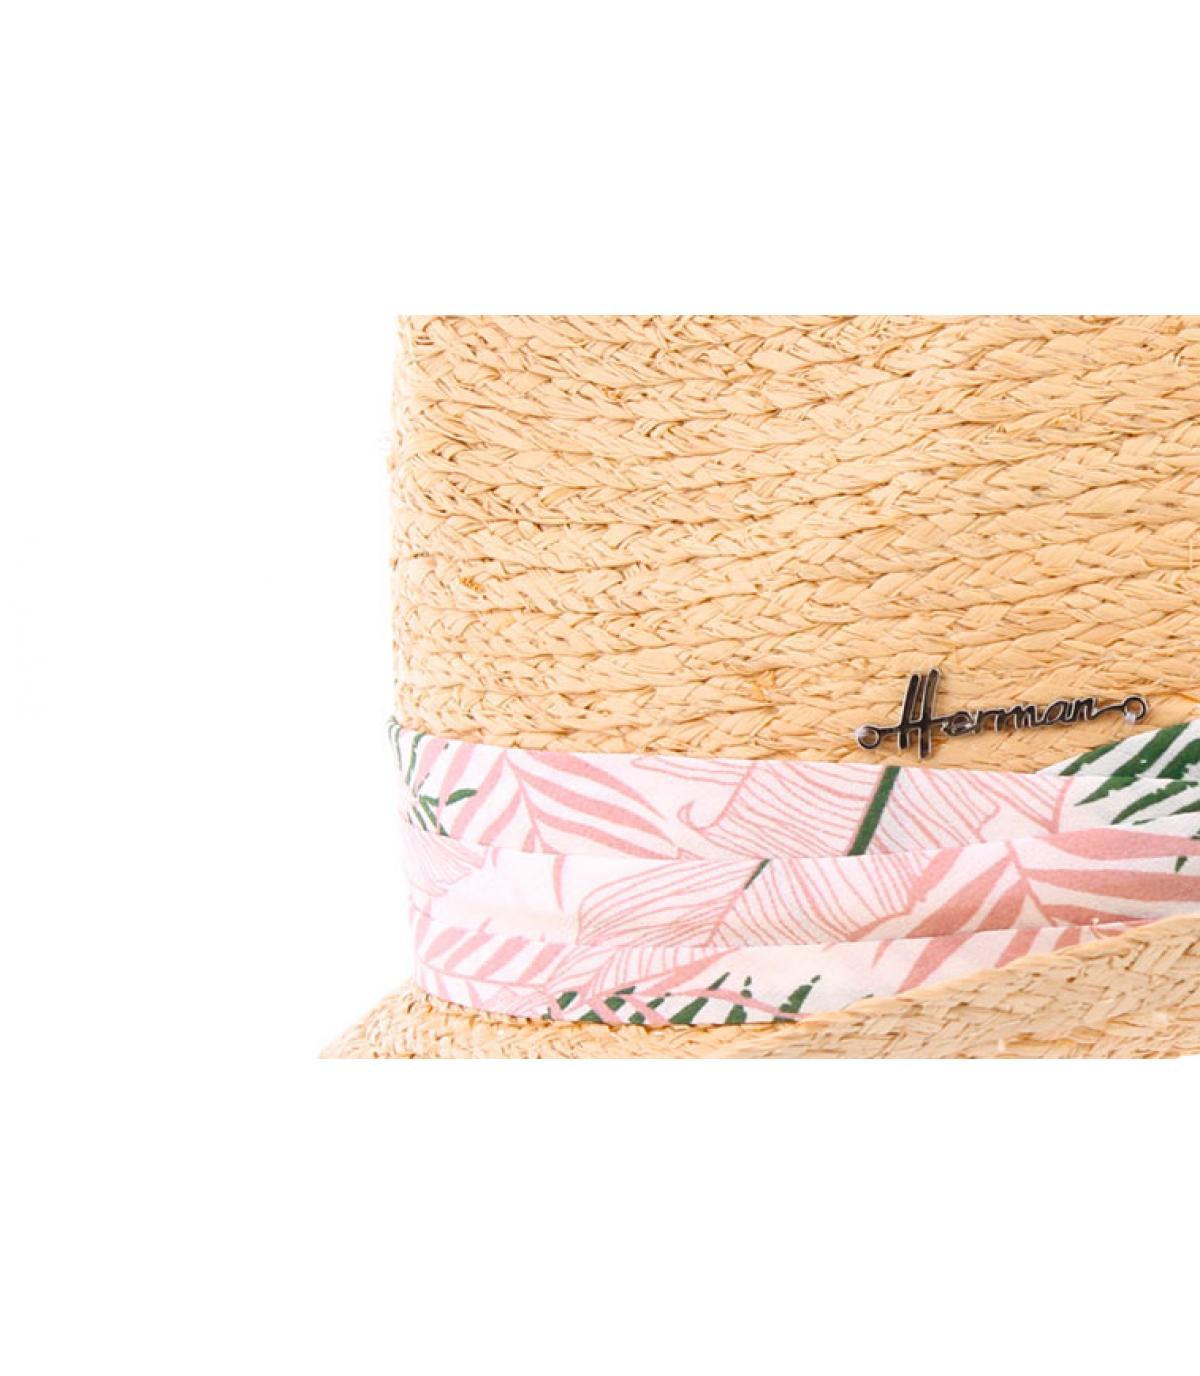 Details Don Sato pink wmn - Abbildung 3